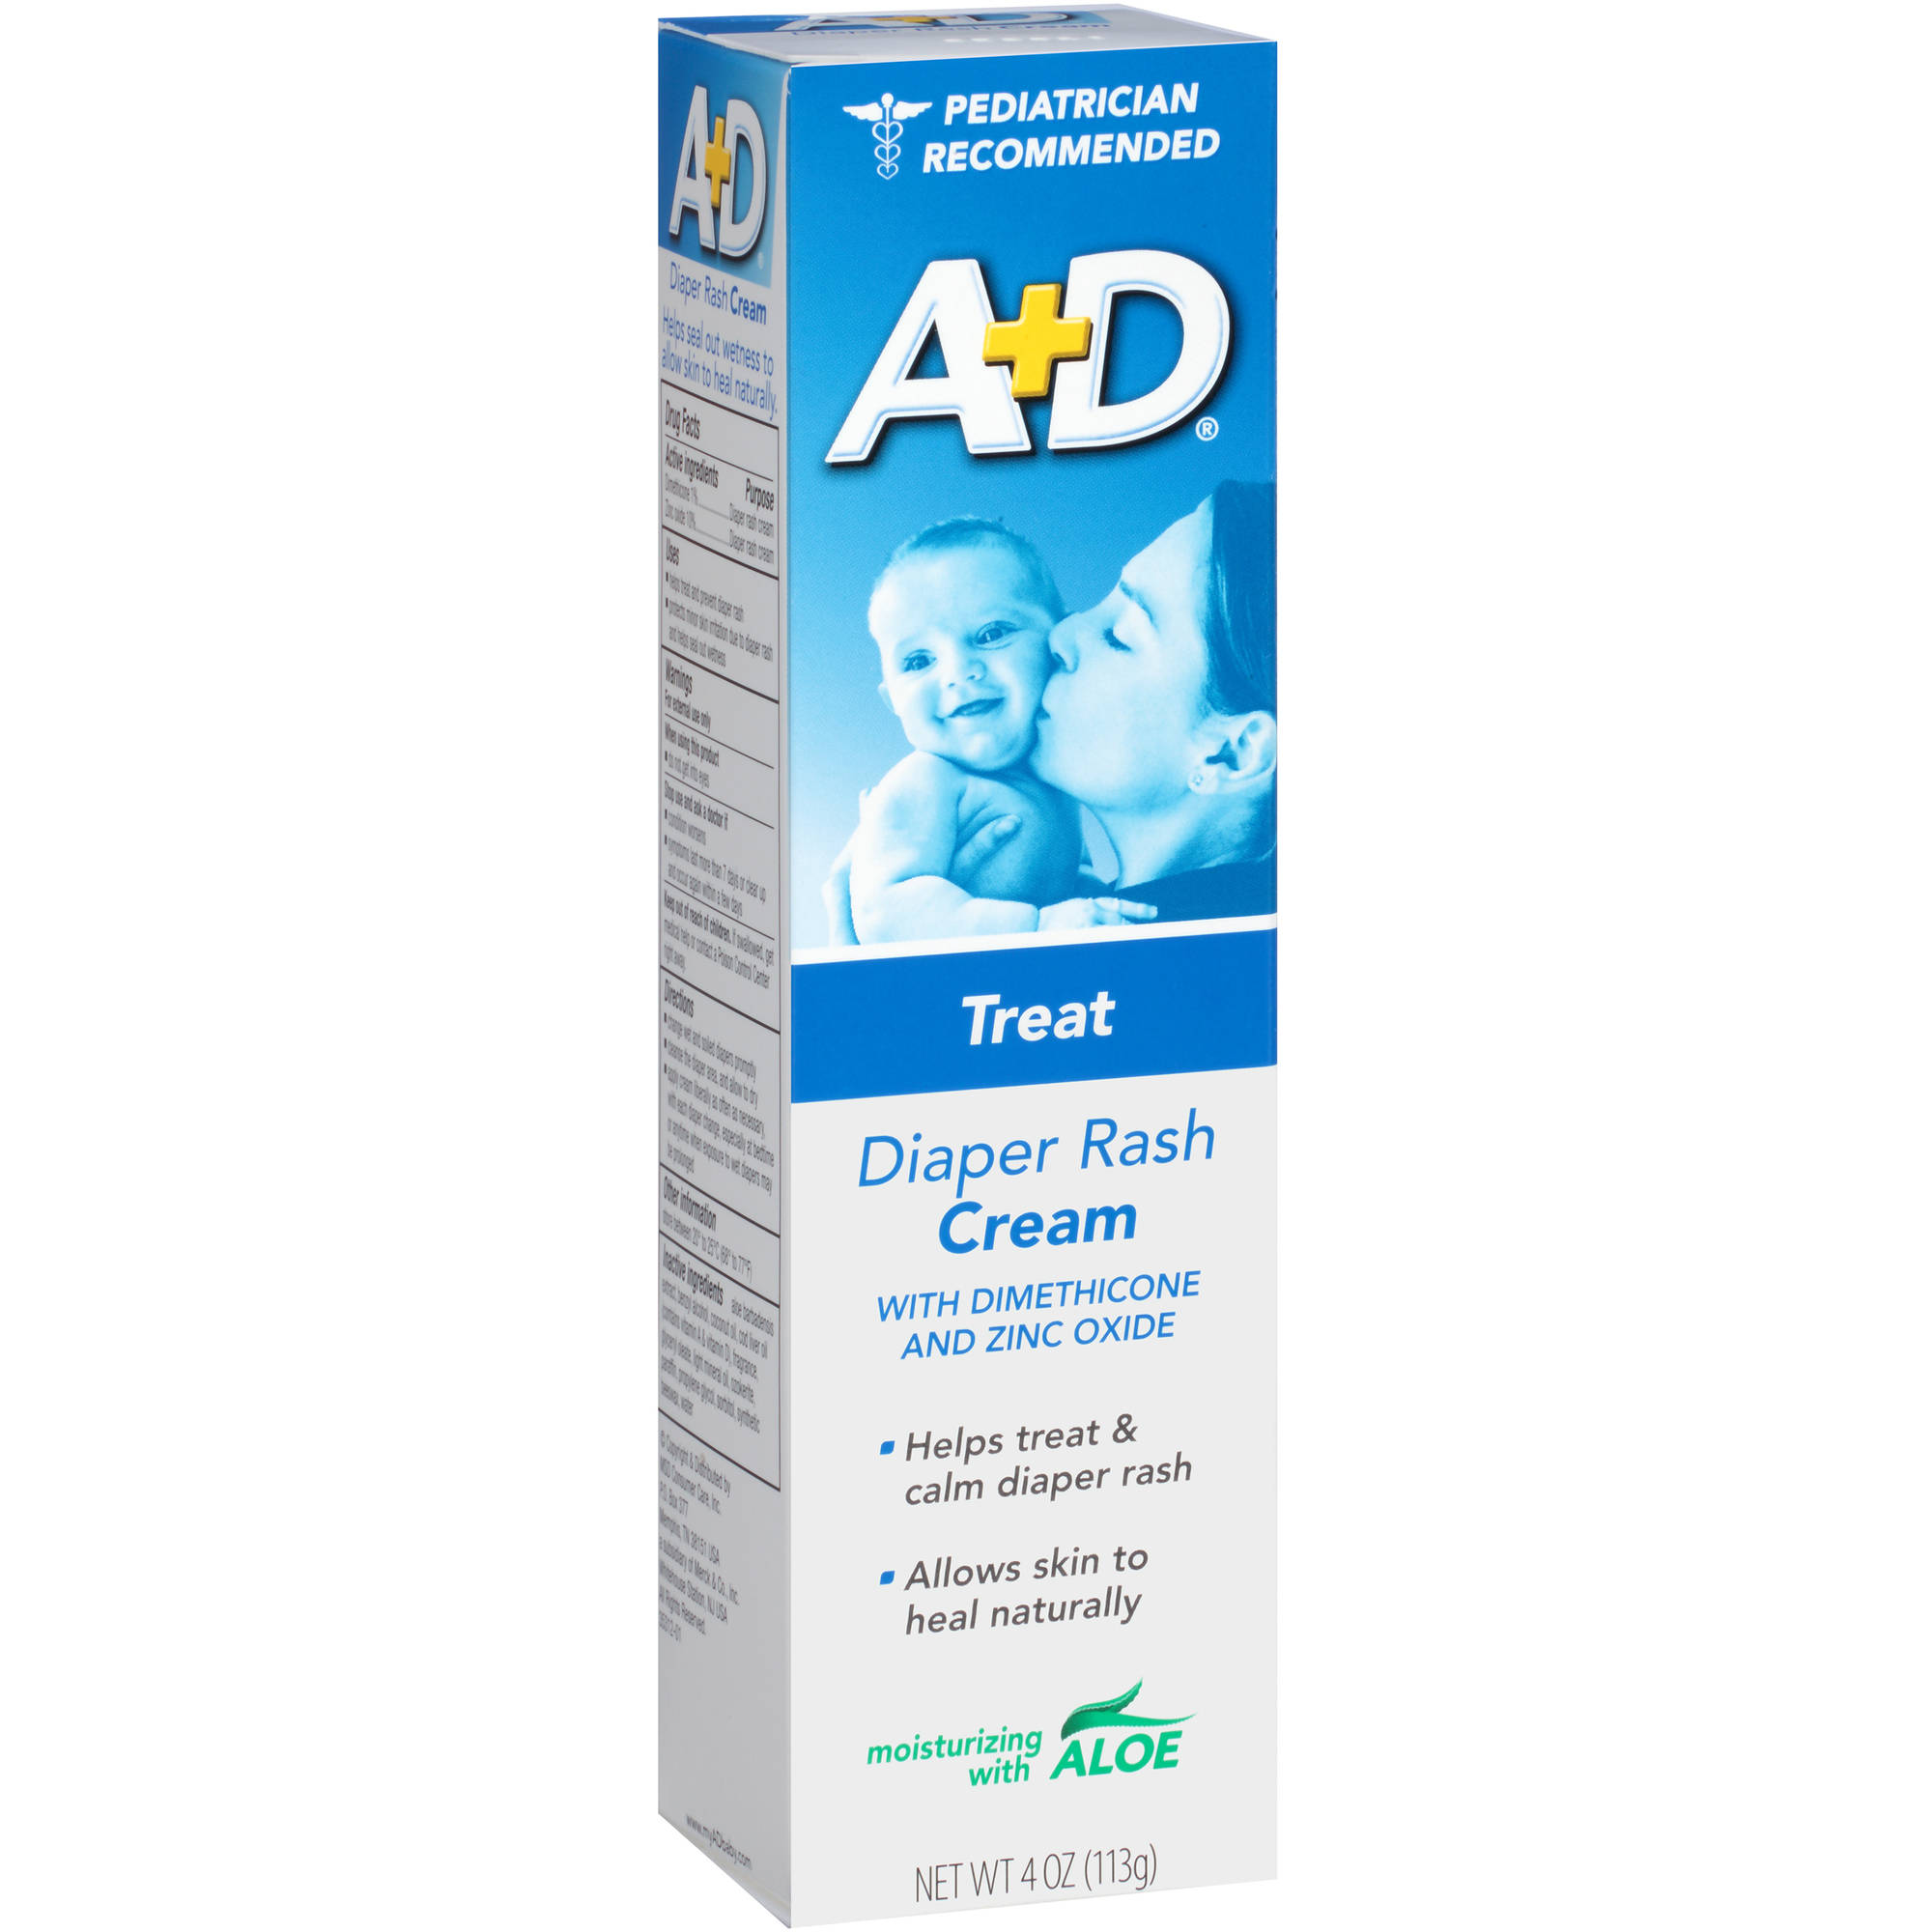 A+D: Diaper Rash Cream W/ Aloe Zinc Oxide Cream, 4 oz